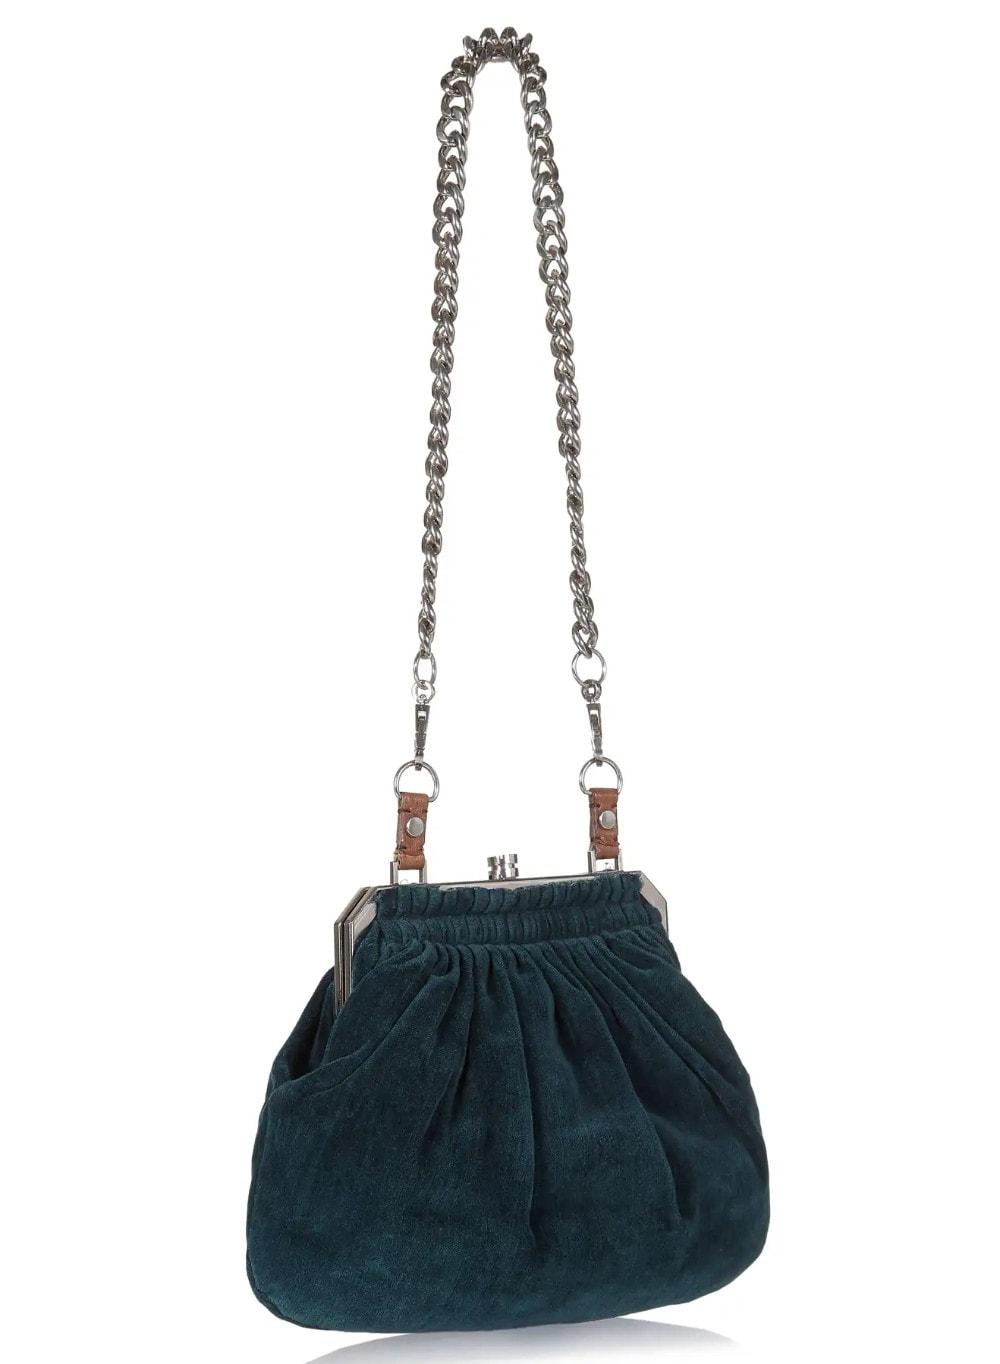 Lanvin Paris Evening Bag _ Minaudière - 2000S Alber Elbaz Era Lanvin Velvet Josephine Shoulder Bag Art Deco Velvet